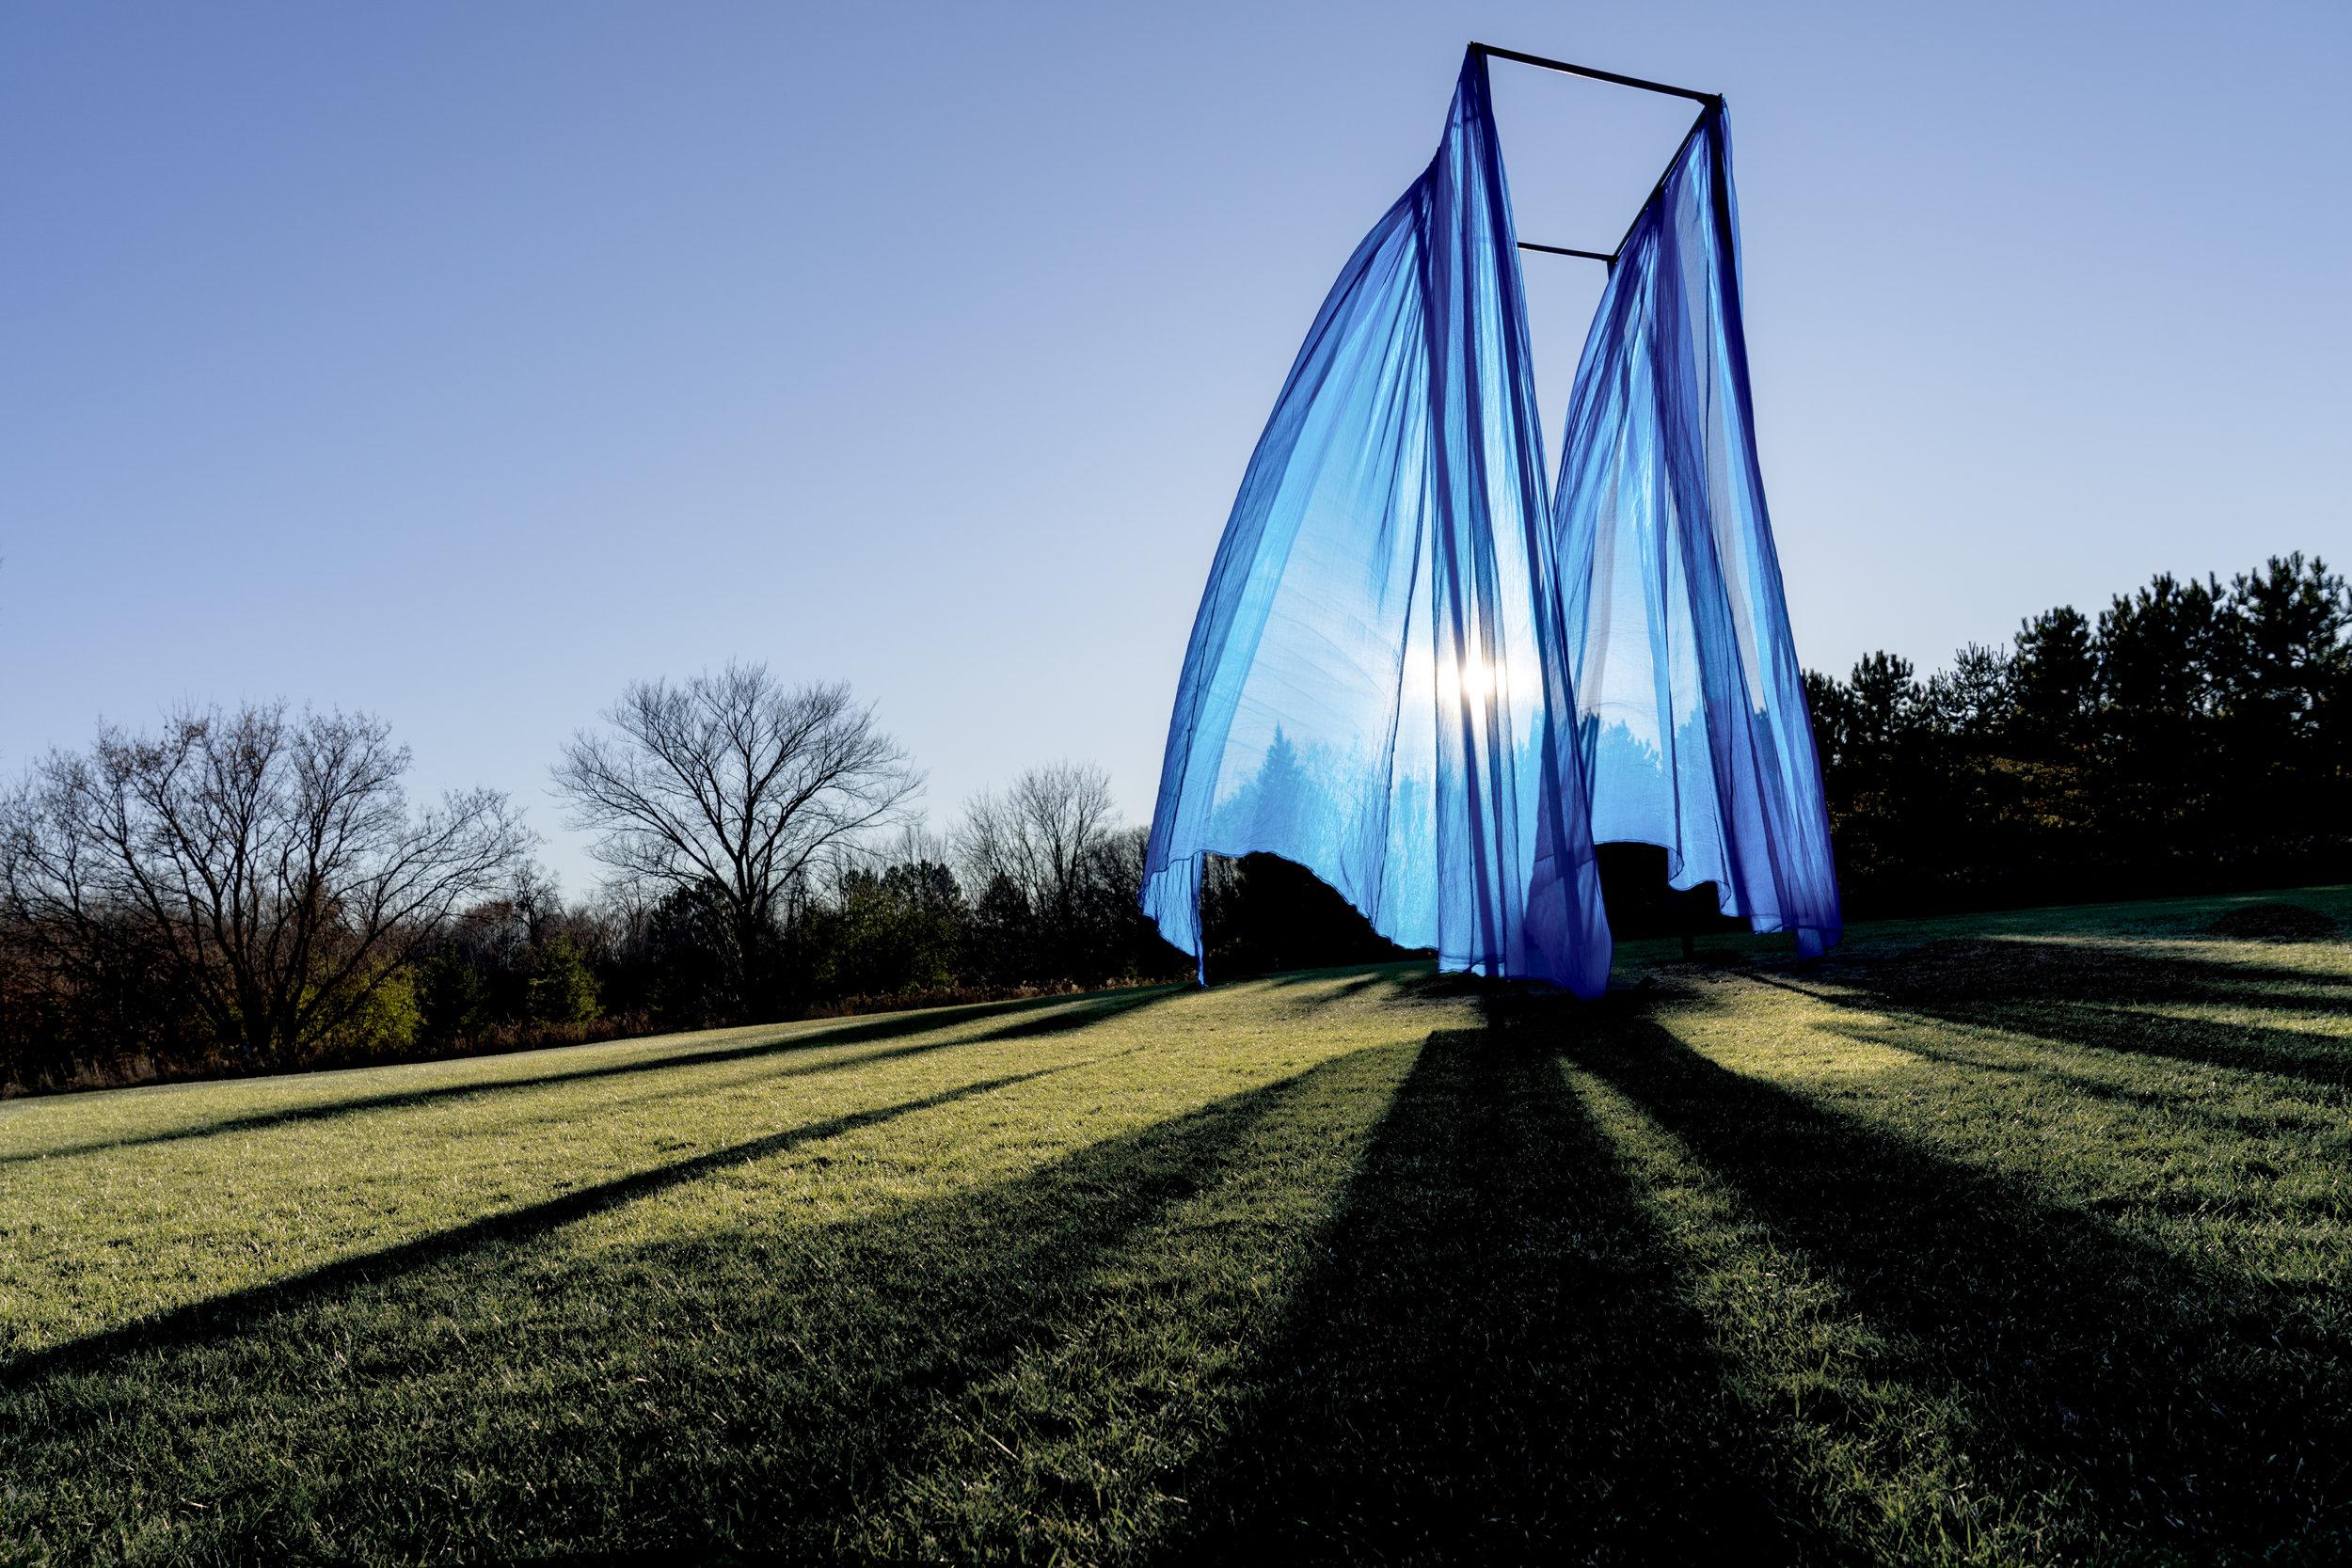 We Move Still by Jordan Rosenow and April Martin, Franconia Sculpture Park, Shafer MN